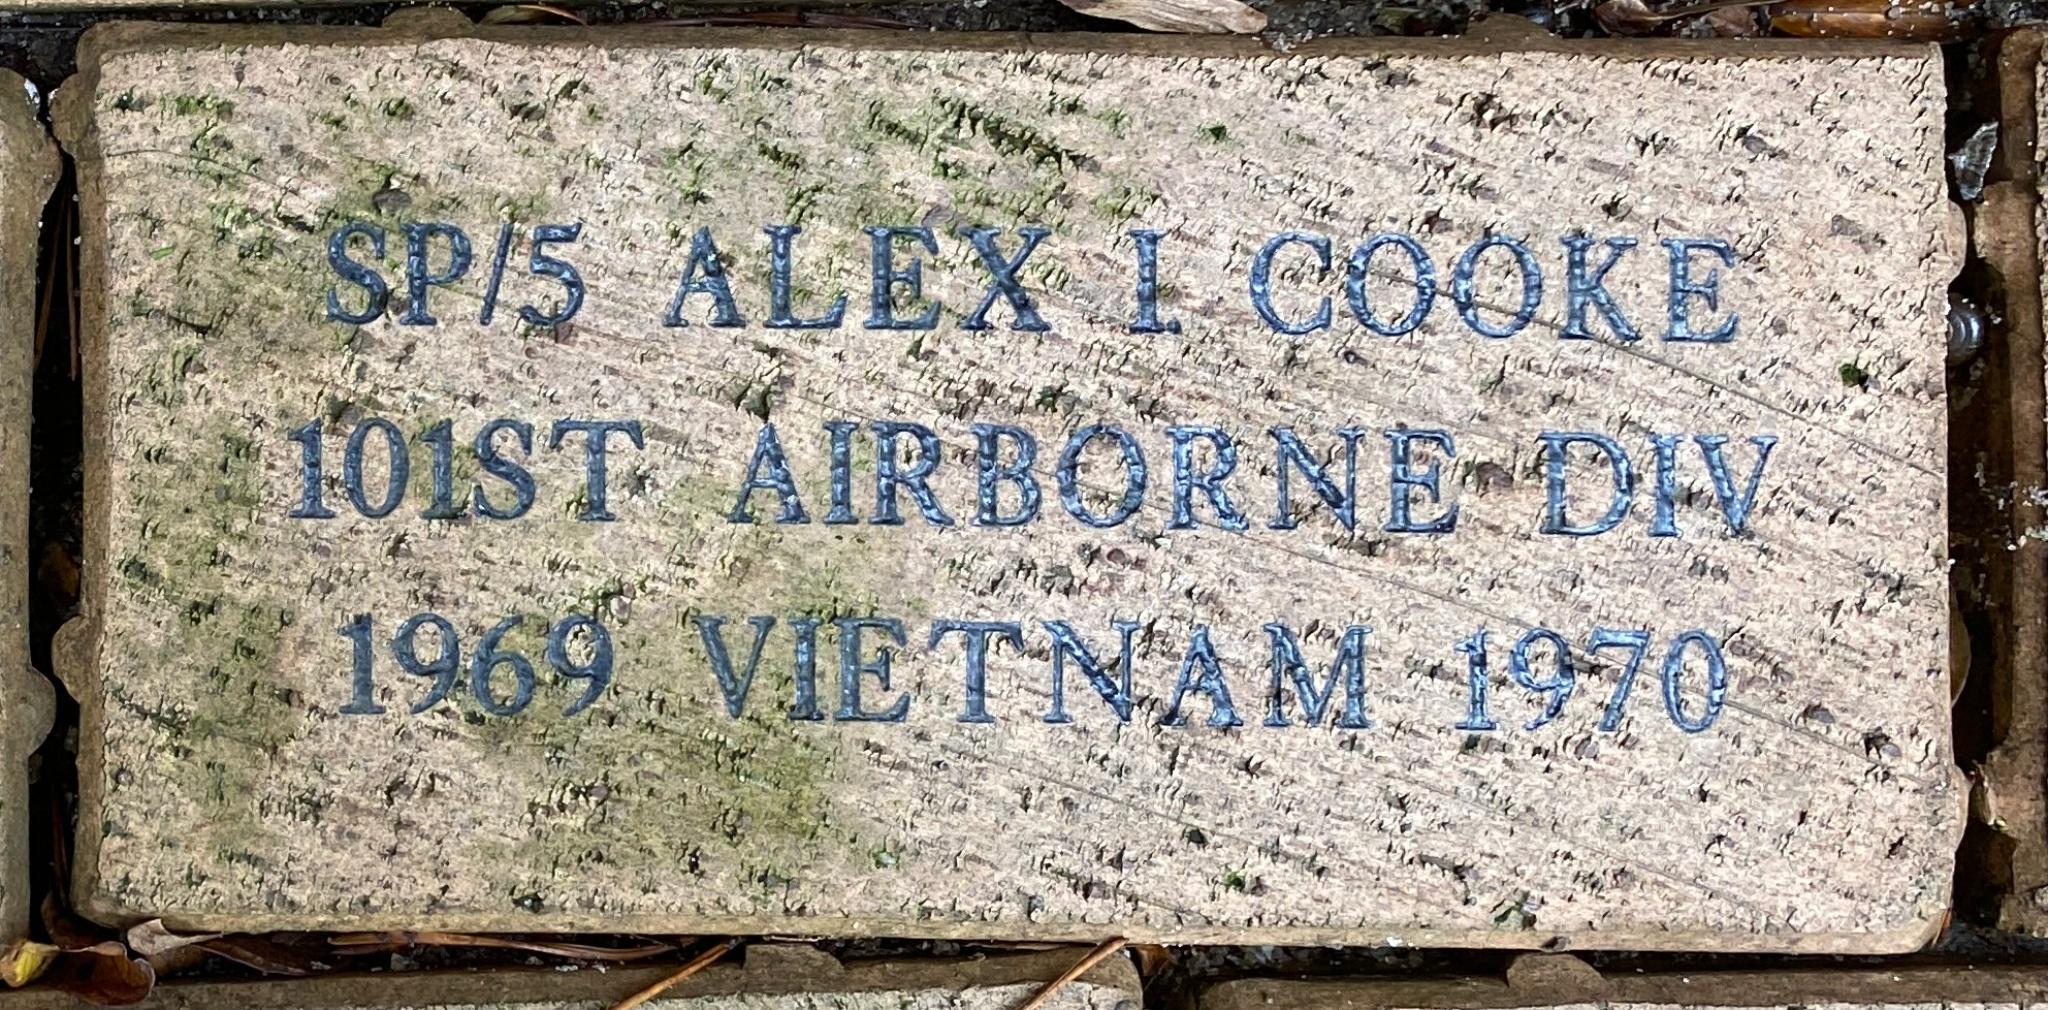 SP/5 ALEX I. COOKE 101ST AIRBORNE DIV 1969 VIETNAM 1970